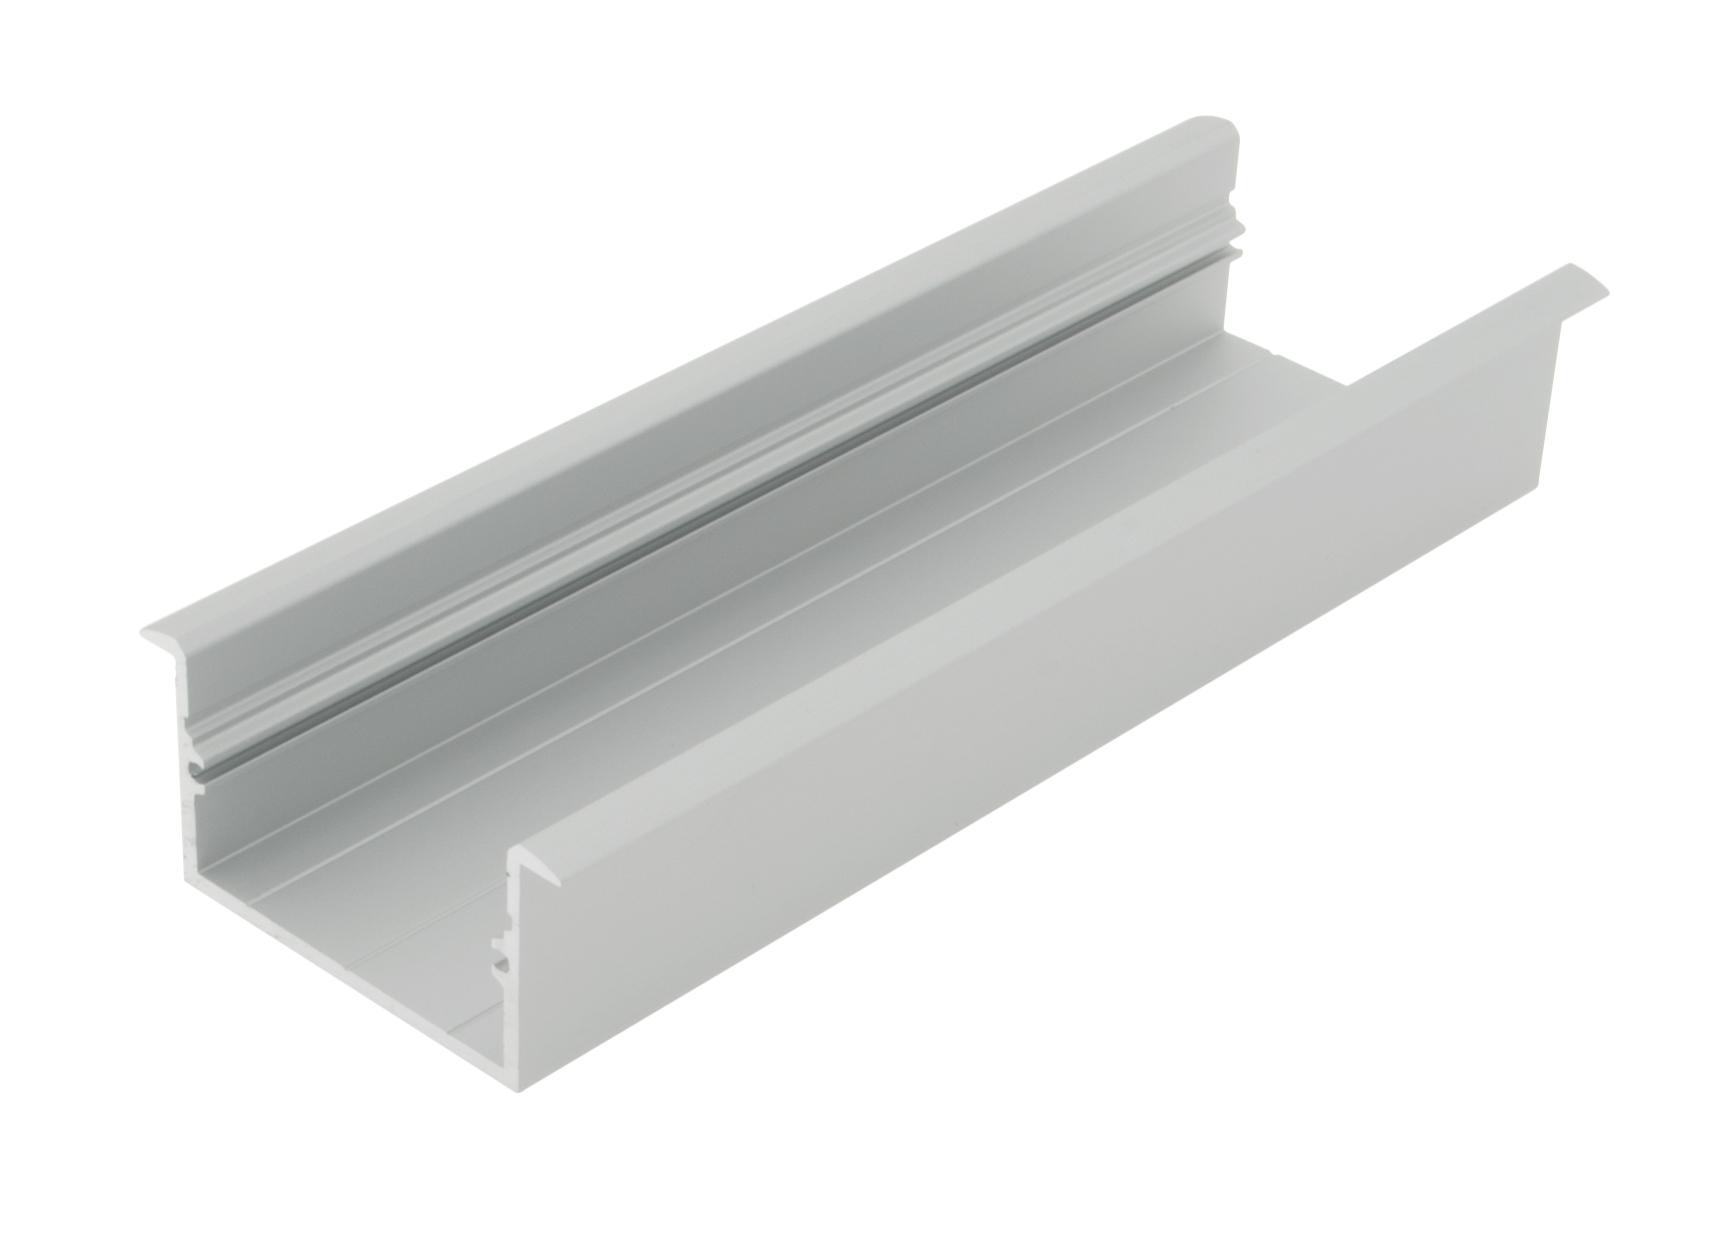 2 m Aluminium Profil MFJ, 2m LIAP005009